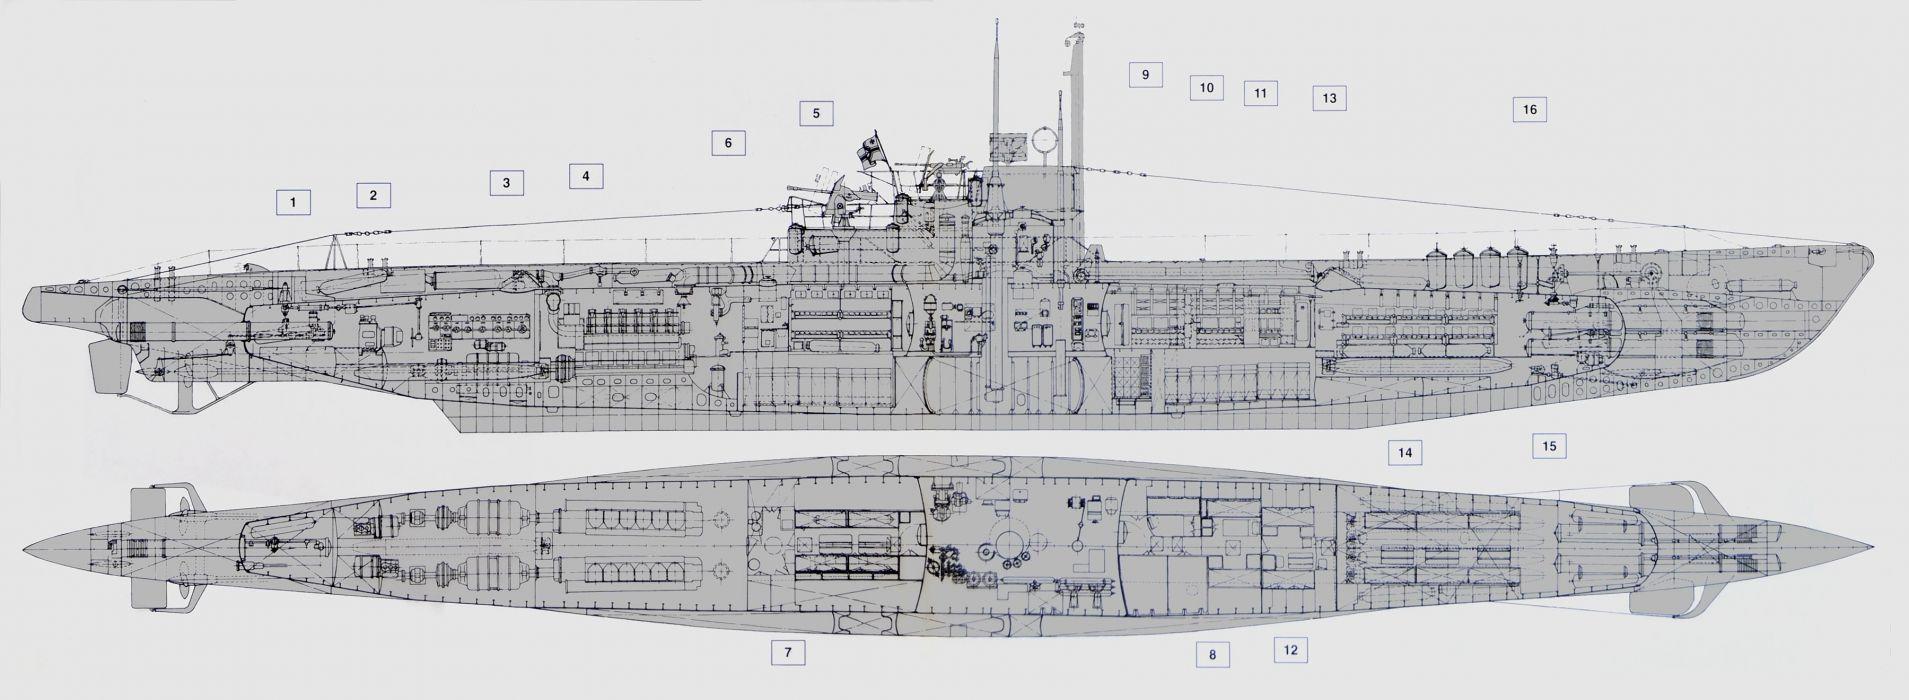 SUBMARINE ship boat military navy wallpaper